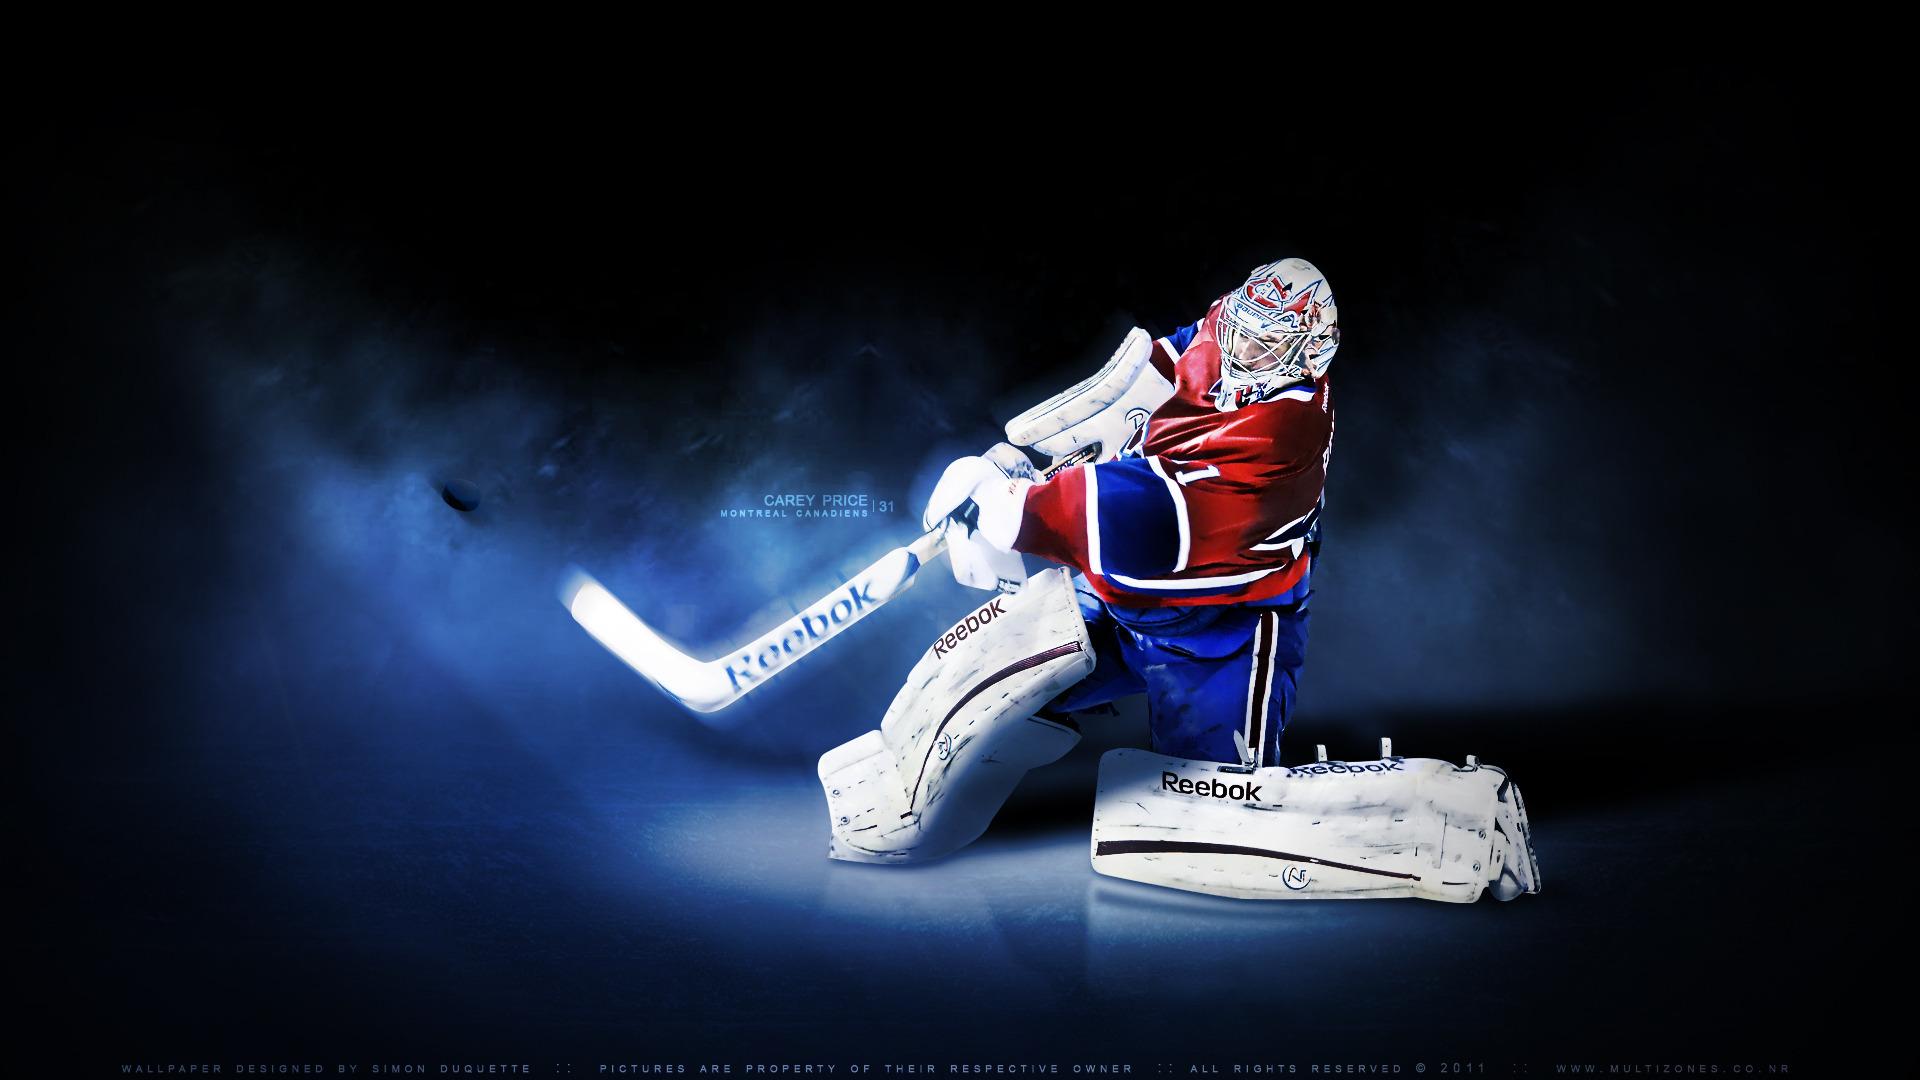 Carey price wallpapers montreal habs montreal hockey 9 html code - Montreal Canadiens Wallpaper 2015